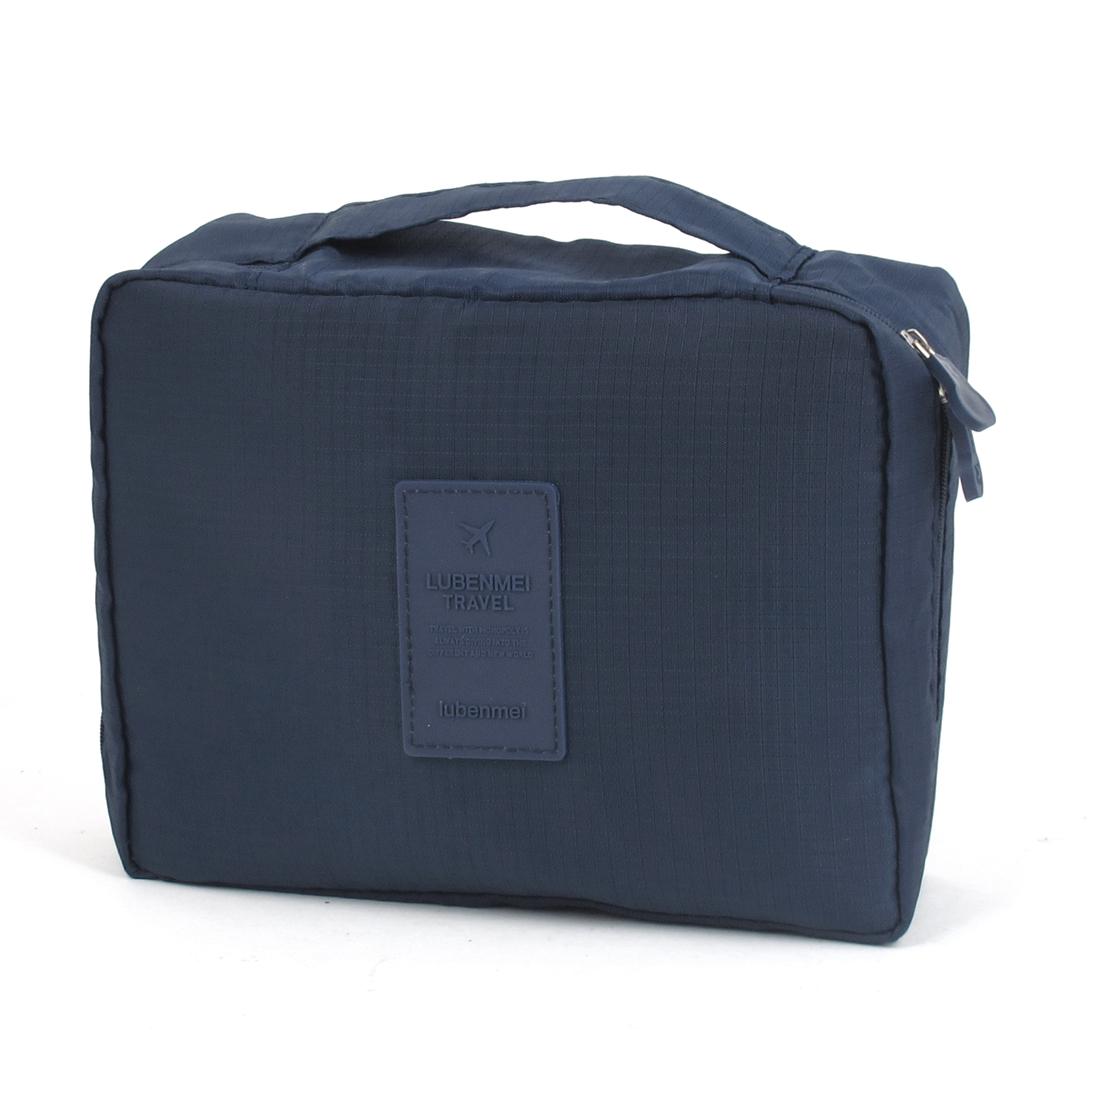 Travel Toiletry Toiletries Cosmetic Shaving Wash Bag Storage Case Dark Blue